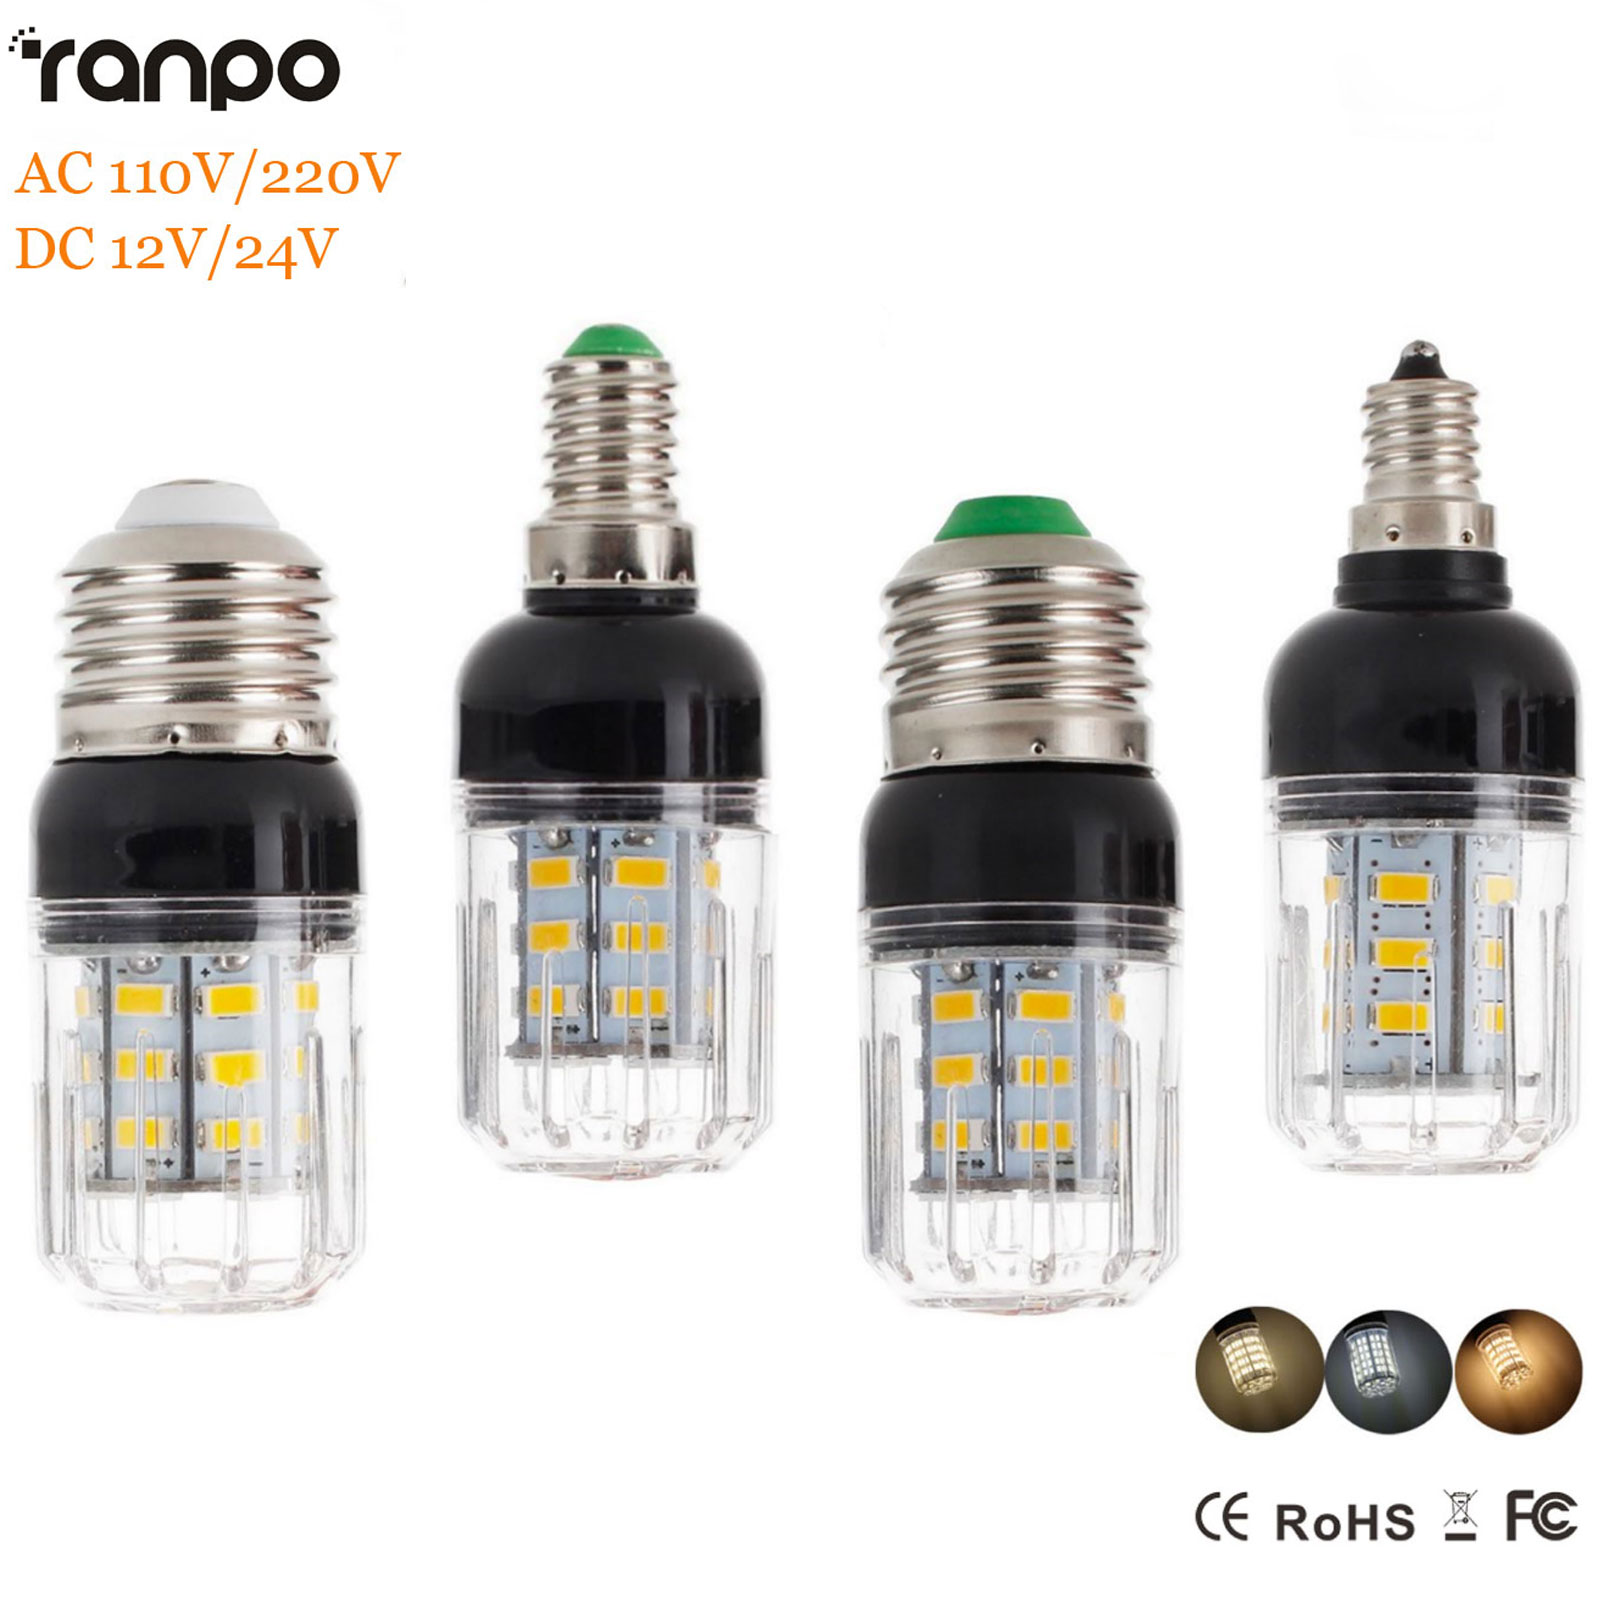 LED Corn Bulb 9-35W E27 E14 E12 E26 B22 5730 SMD Light Bright 110V 220V DC 12V